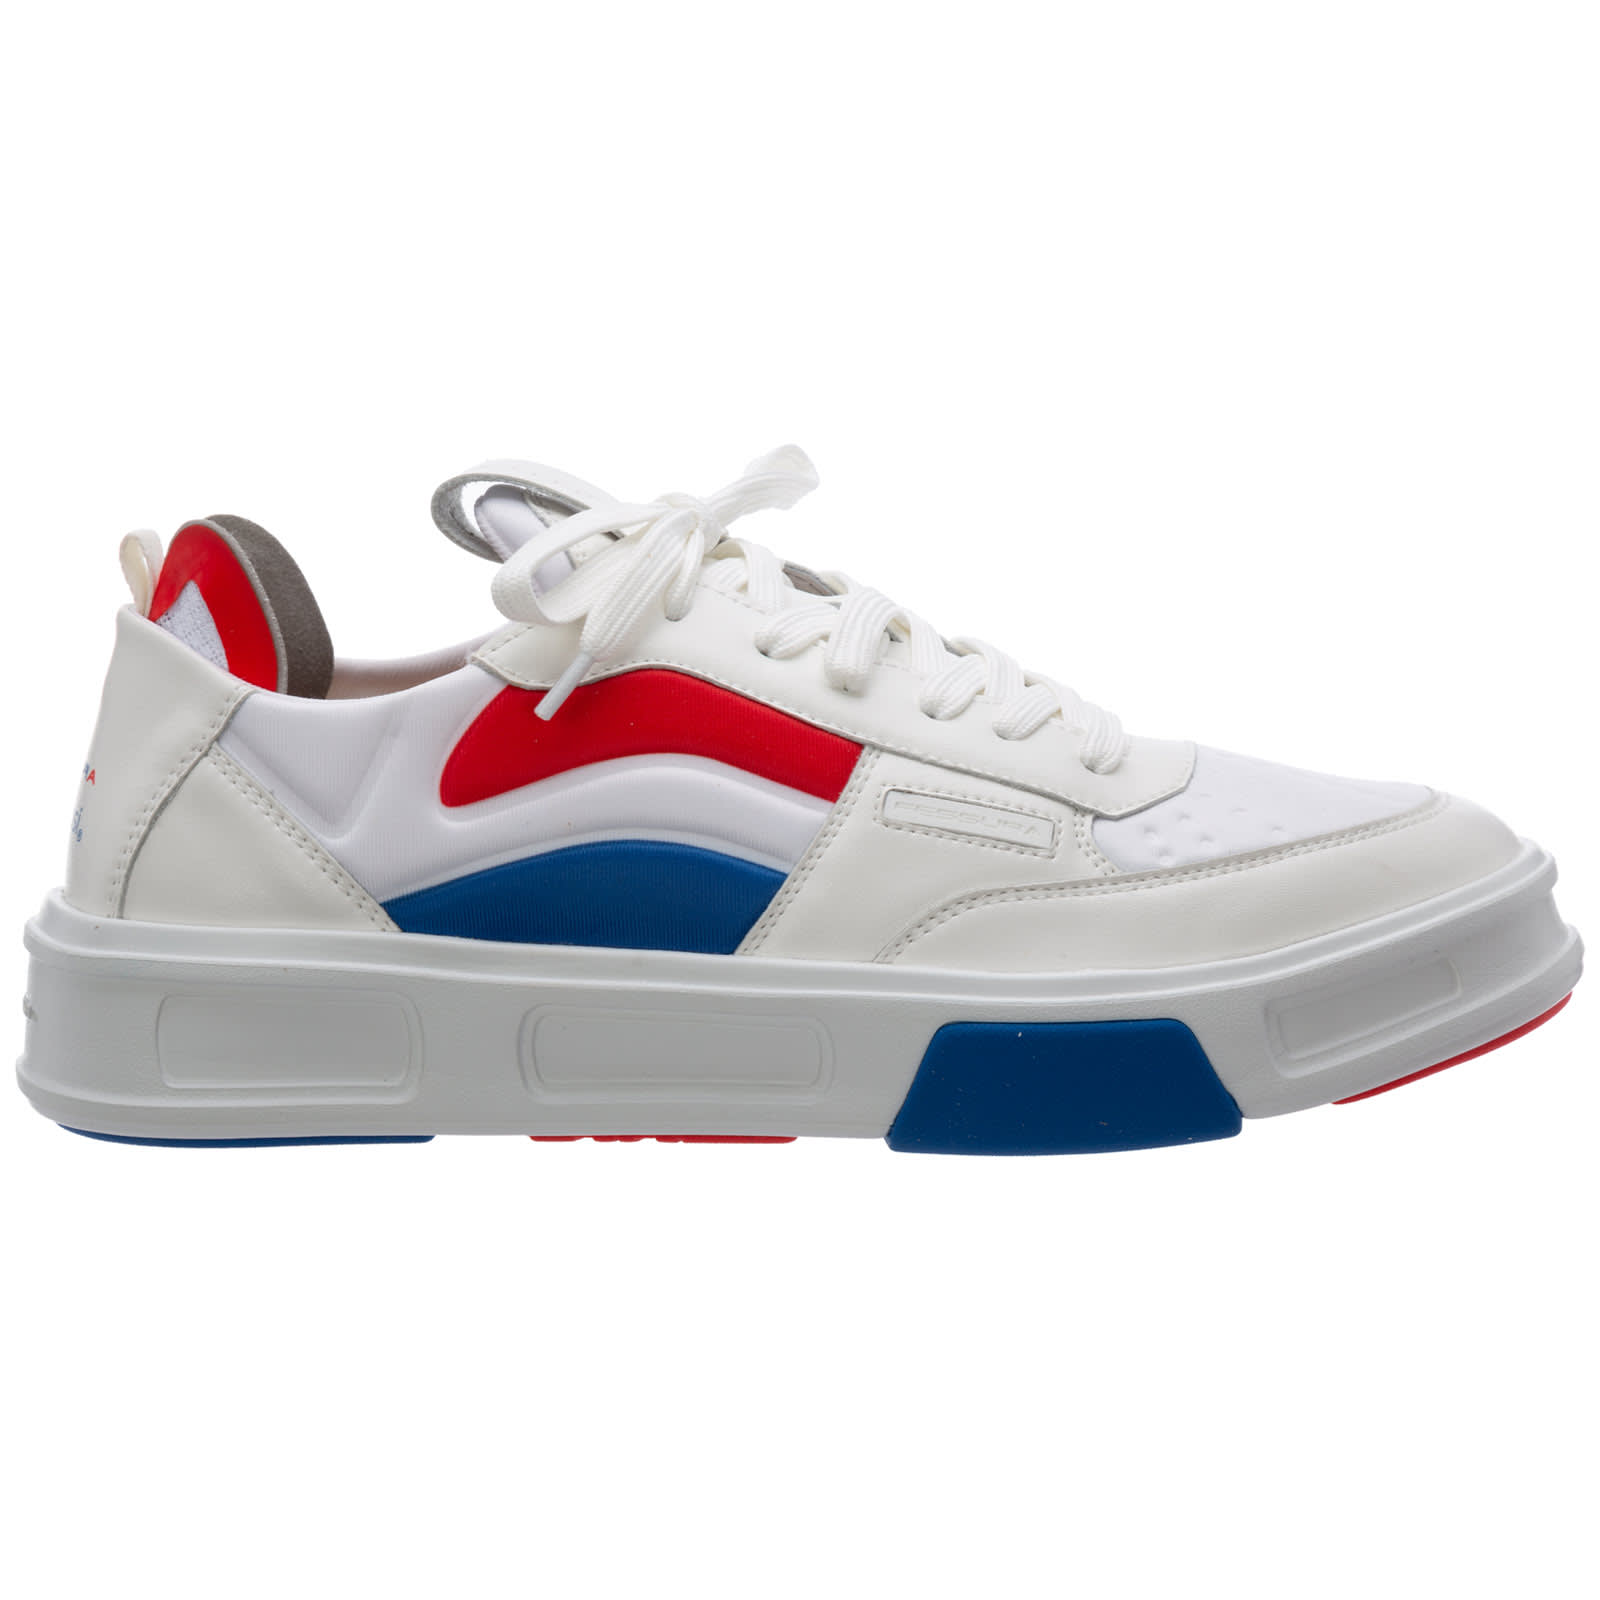 X Pepsi Reflex Sneakers